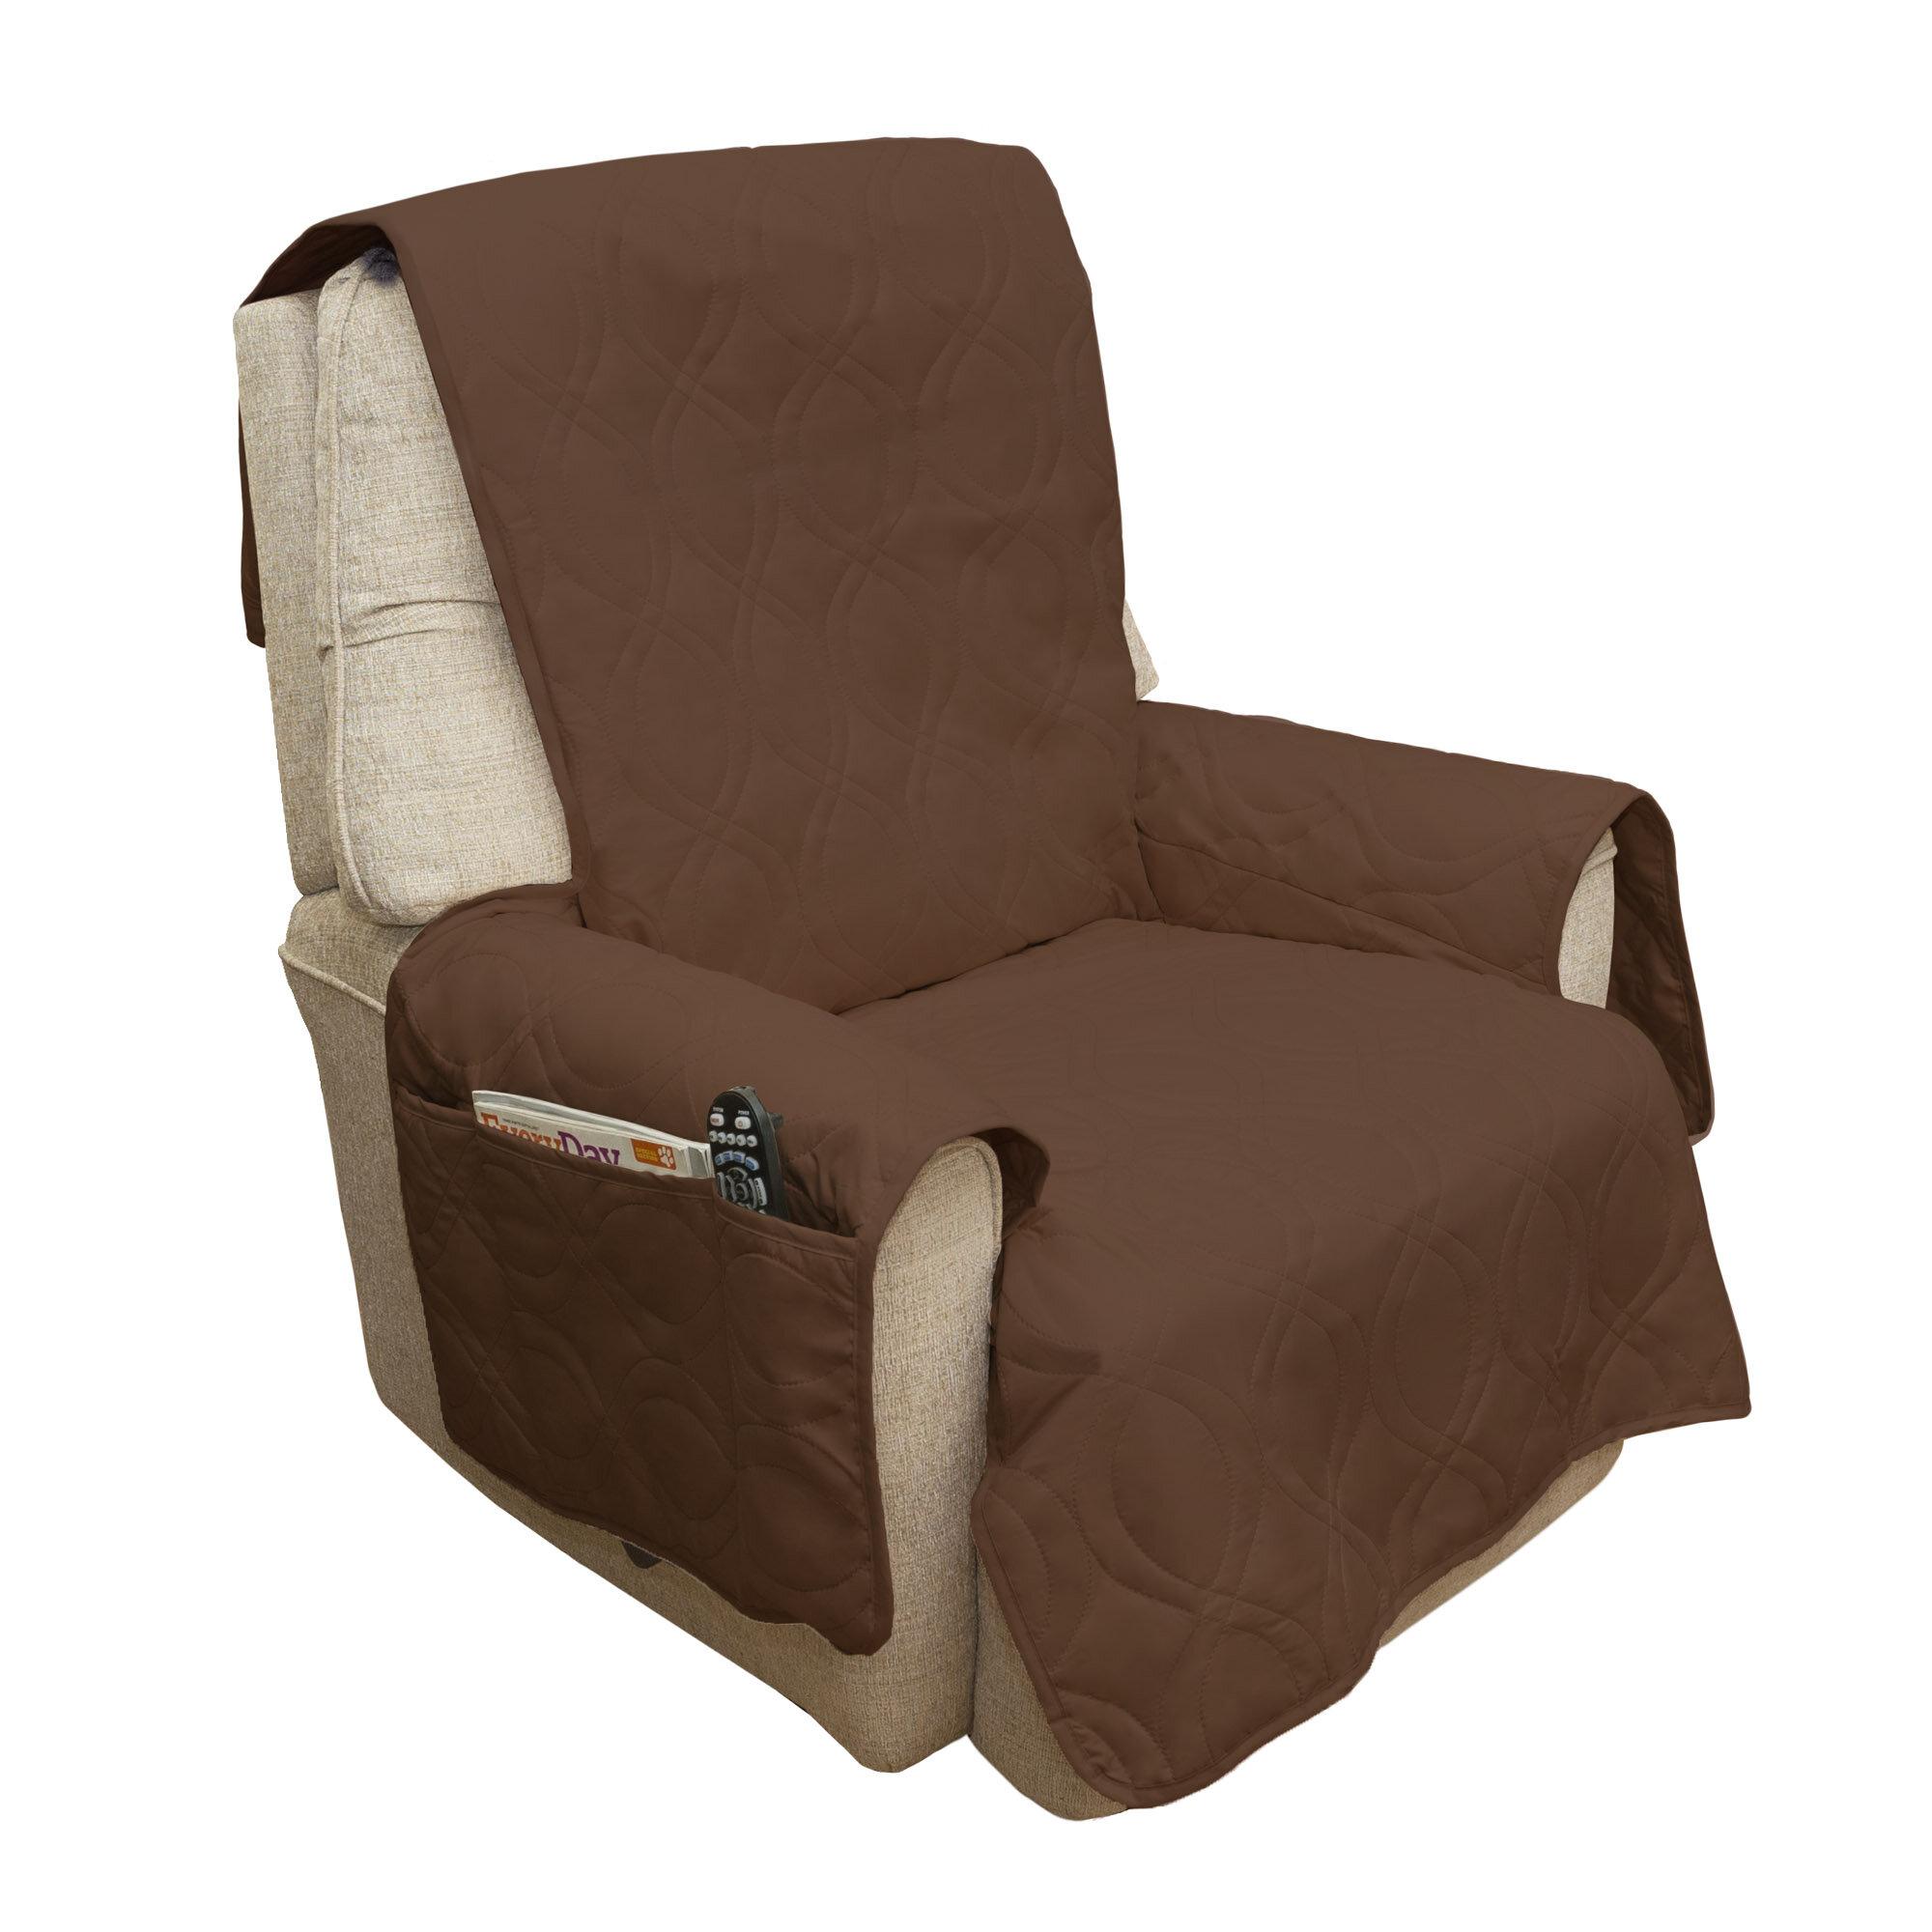 Petmaker Waterproof Quilted Box Cushion Armchair Slipcover U0026 Reviews |  Wayfair